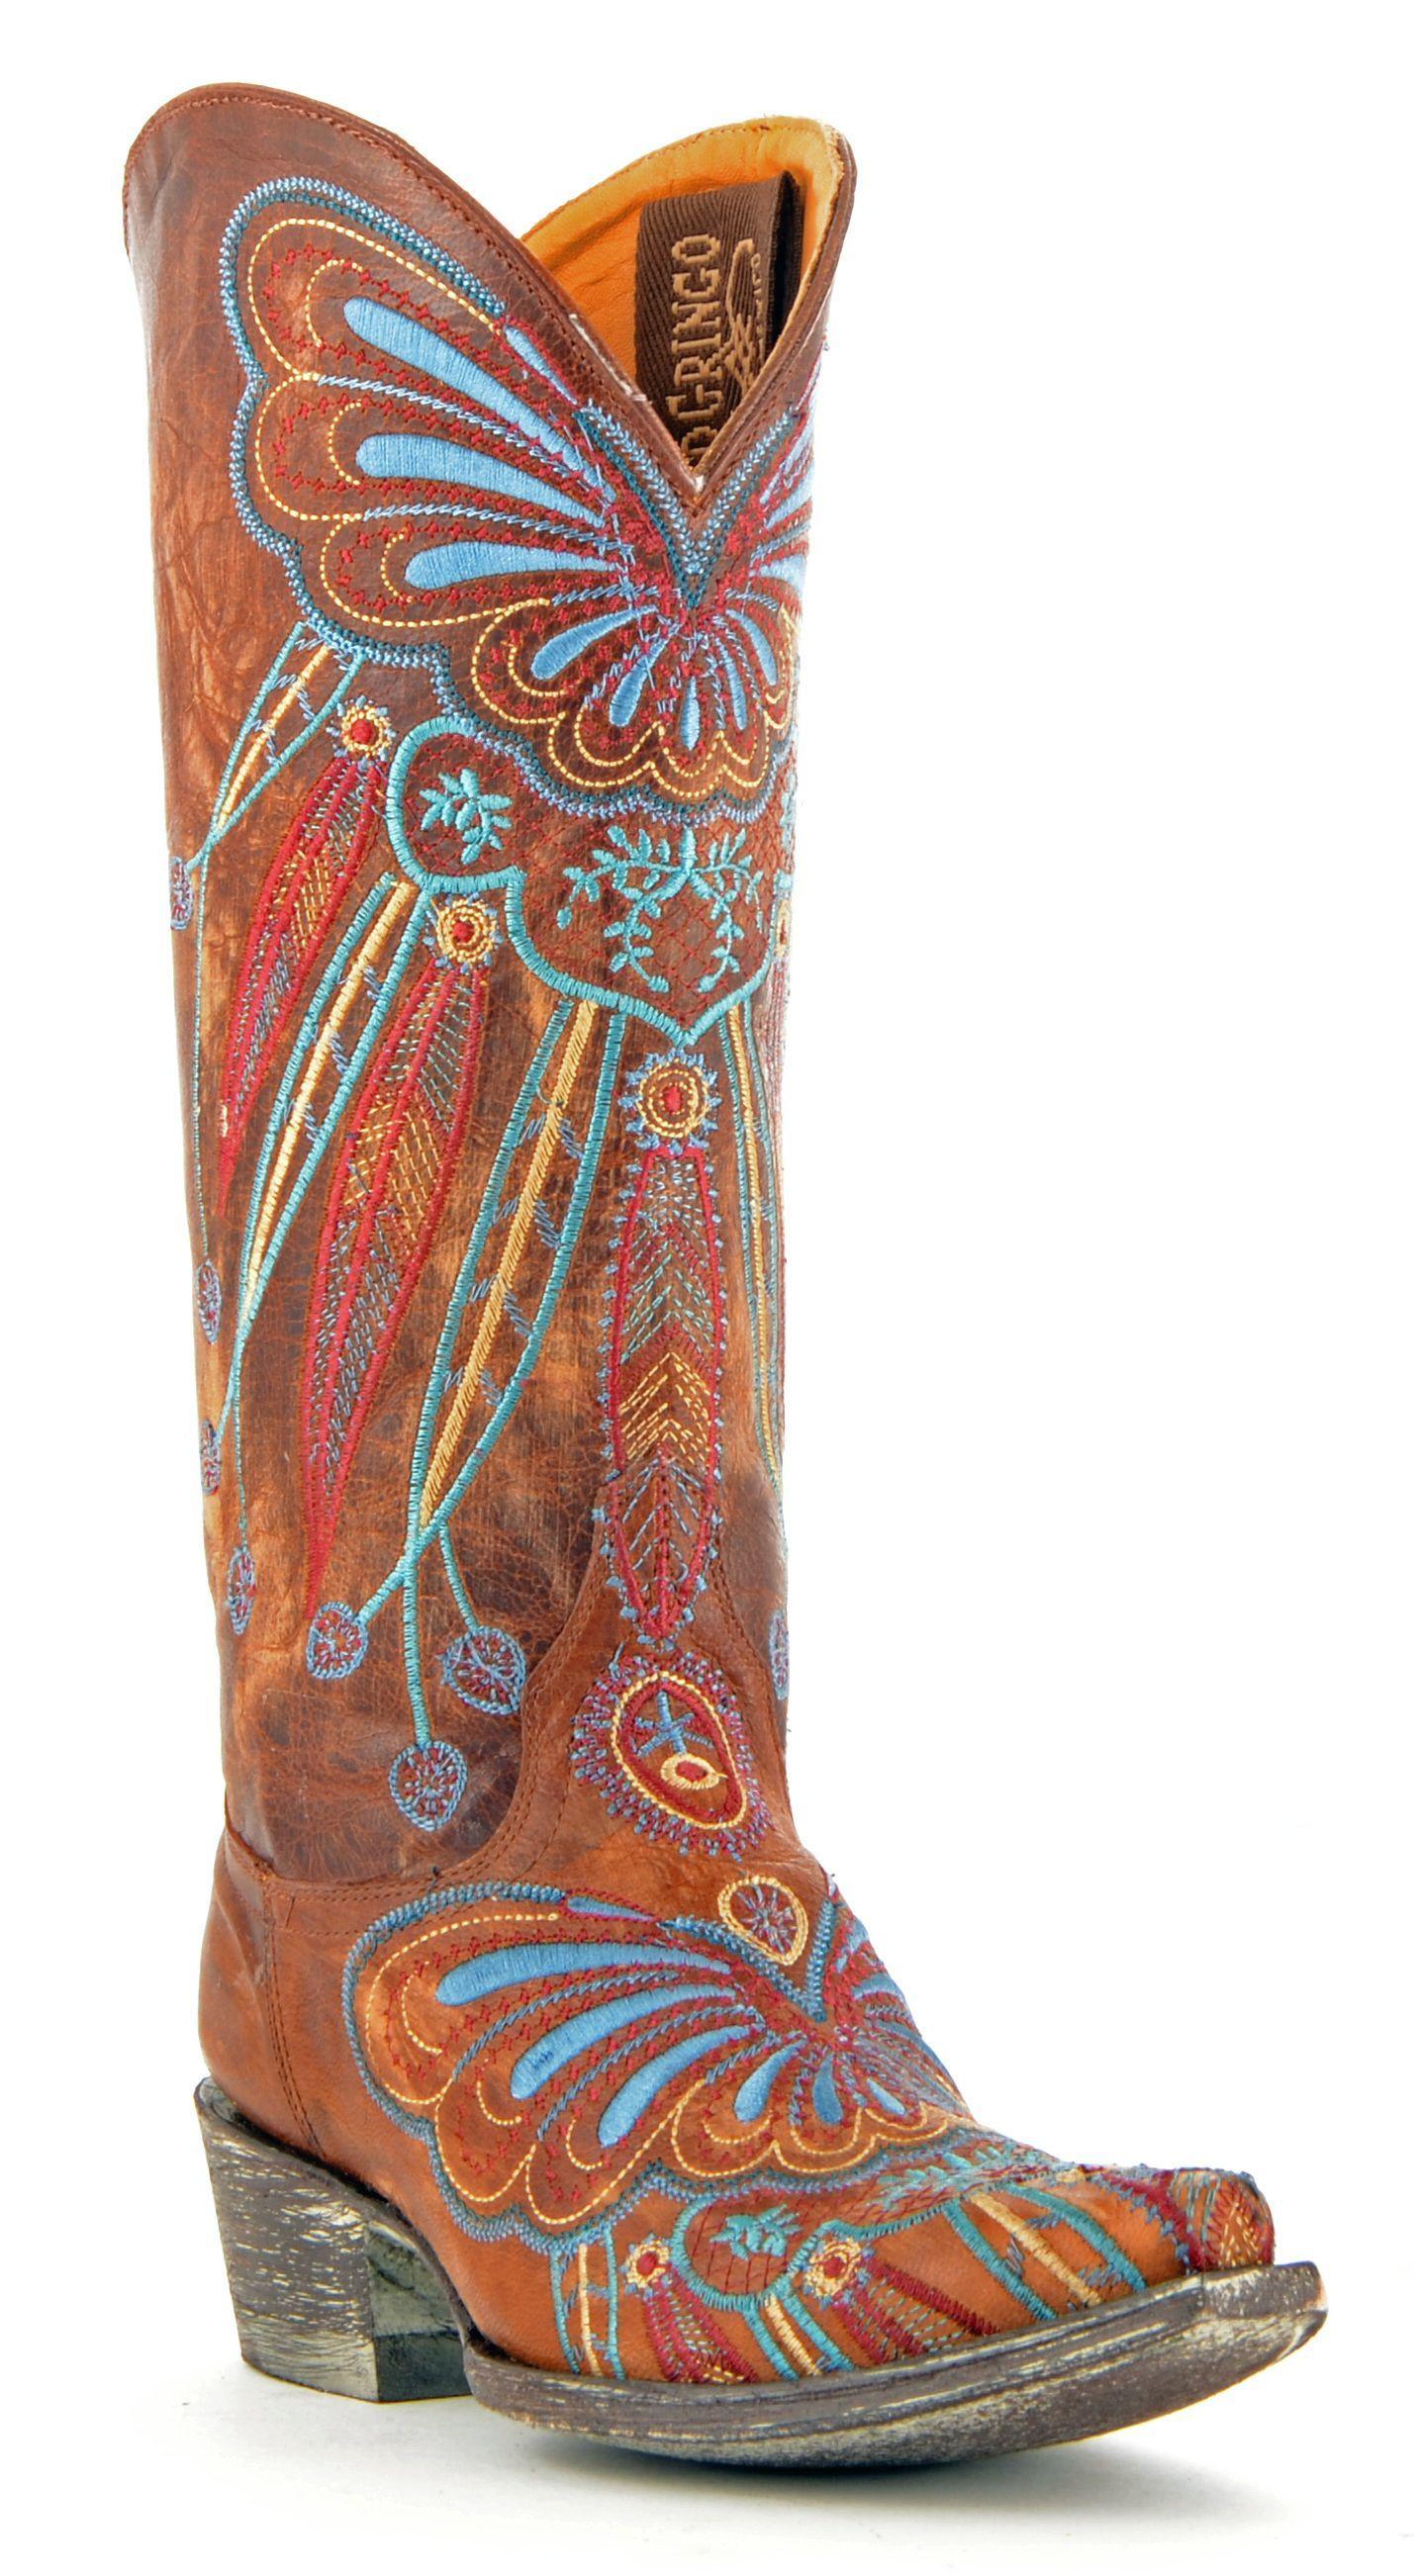 11e9d2bb4ba Old Gringo Brass Lakota Boots www.maverickstyle.net | Maverick Style ...